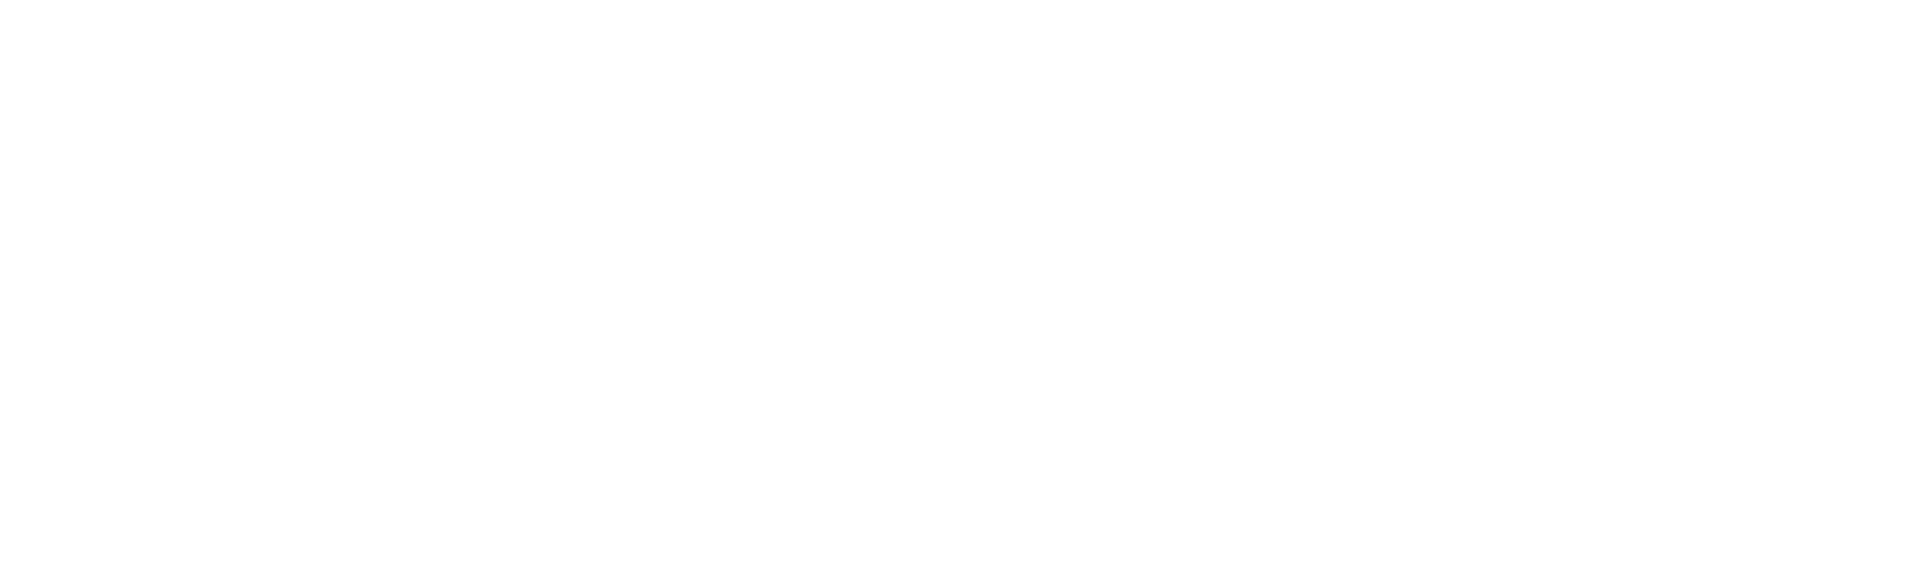 Blank Slider Template